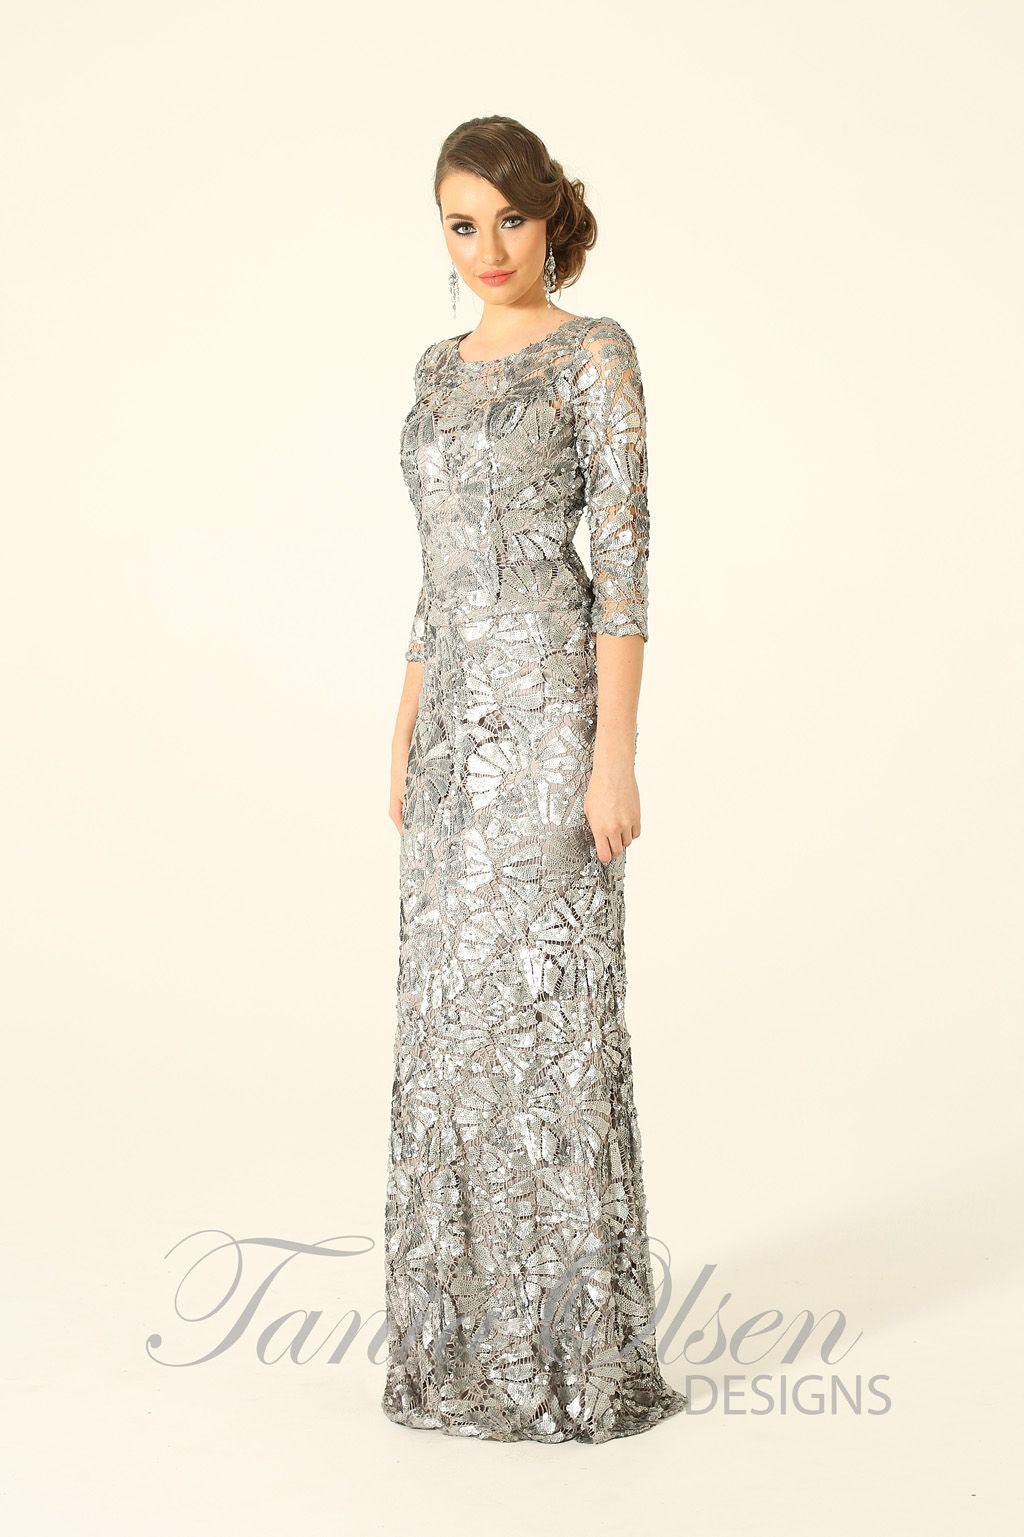 Silver Viola evening dress | Viola, Dress designs and Olsen